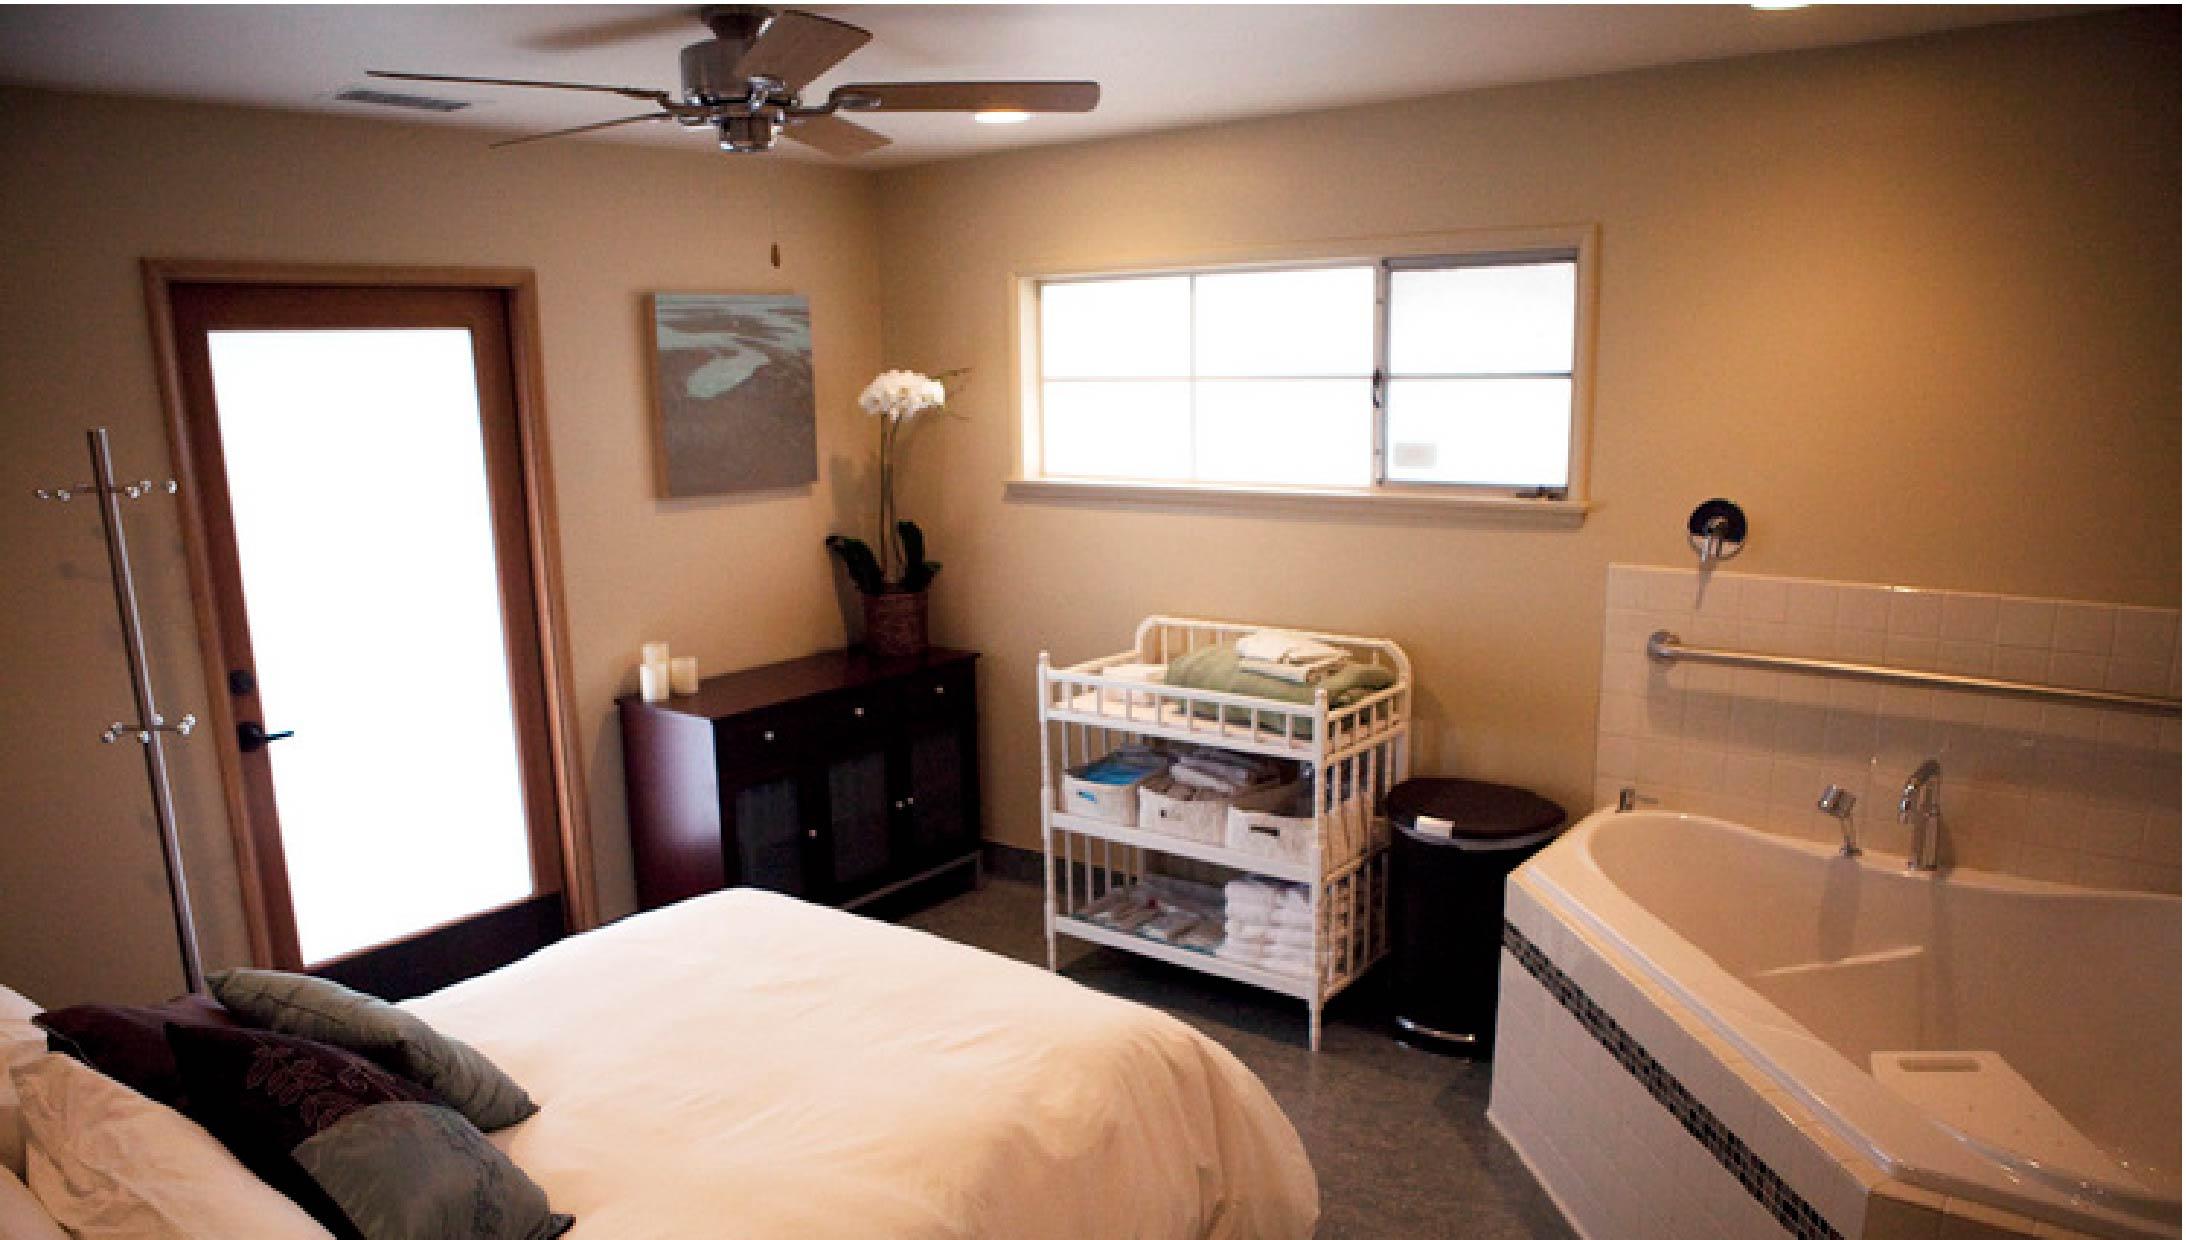 Santa Barbara Birth Center